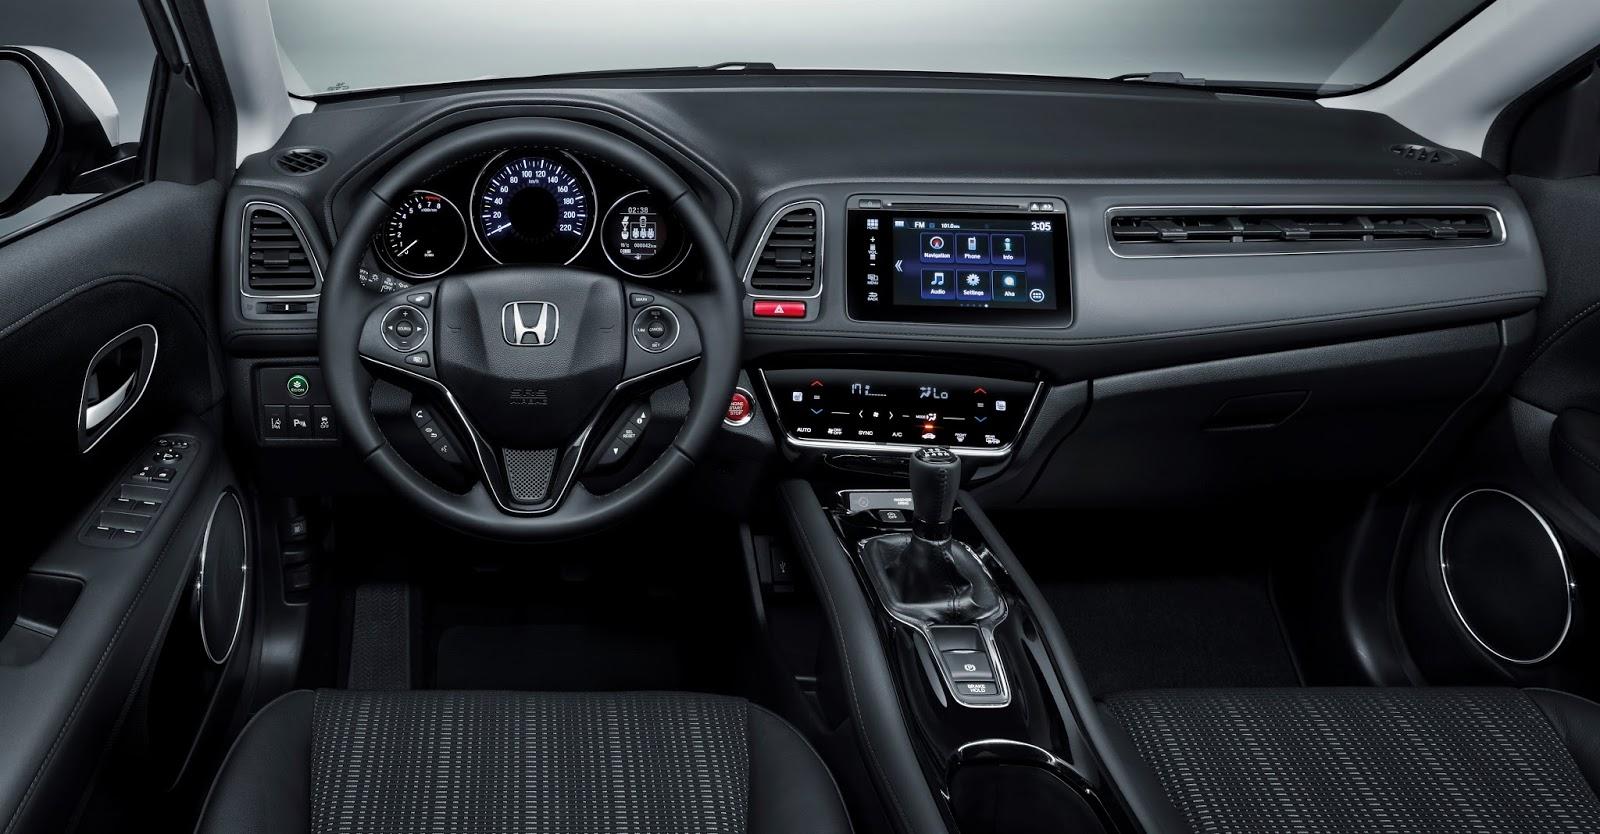 54595 All new HR V Όλες οι λεπτομέρειες για το νέο Honda HR-V Honda, Honda HR-V, HR-V, SUV